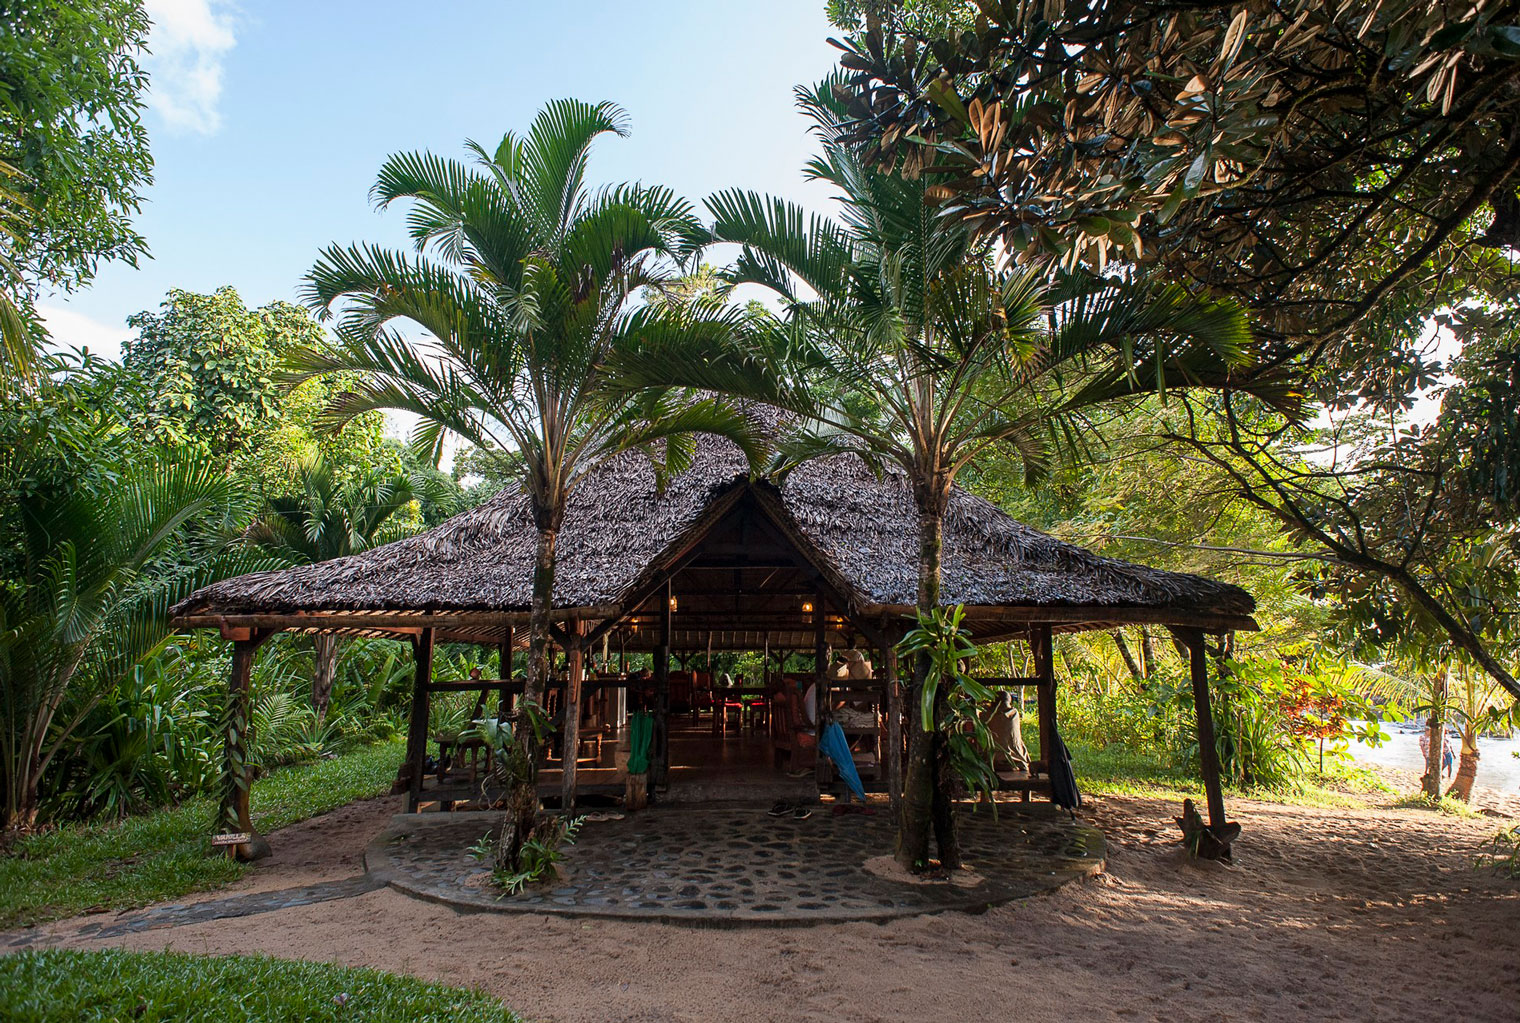 Masoala-Forest-Lodge-East-Madagascar-Beach-House